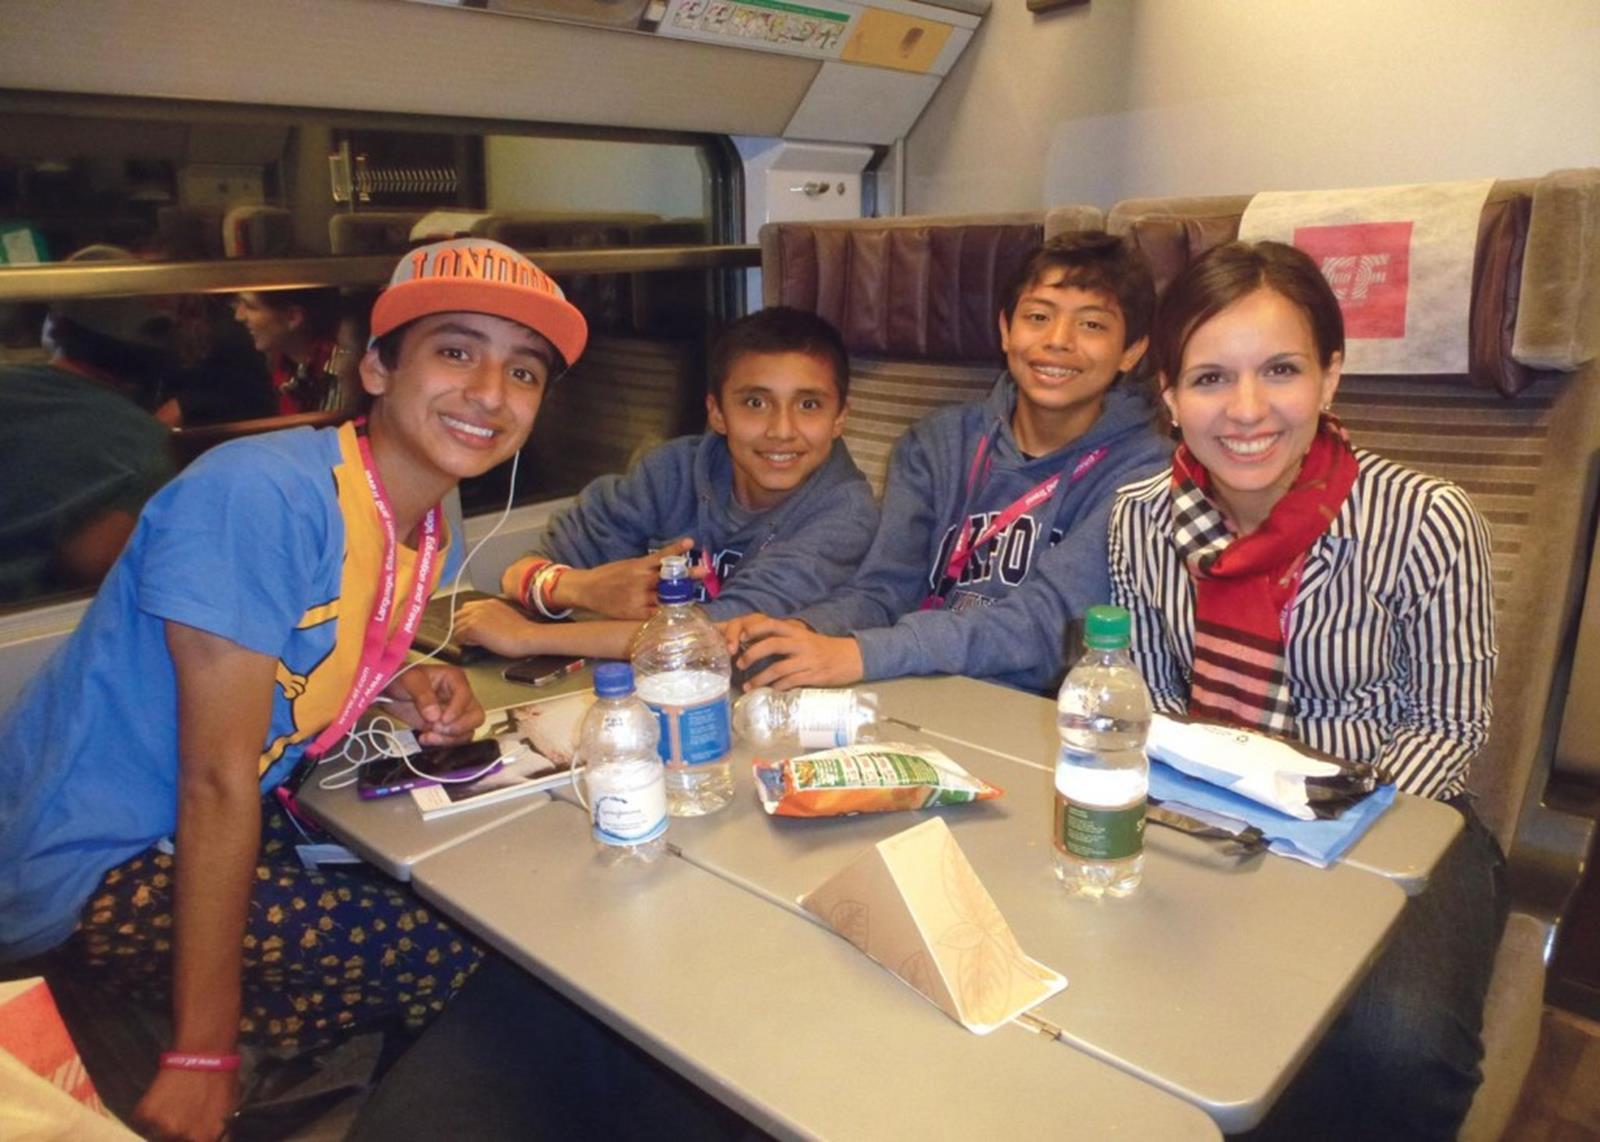 Students on Eurostar